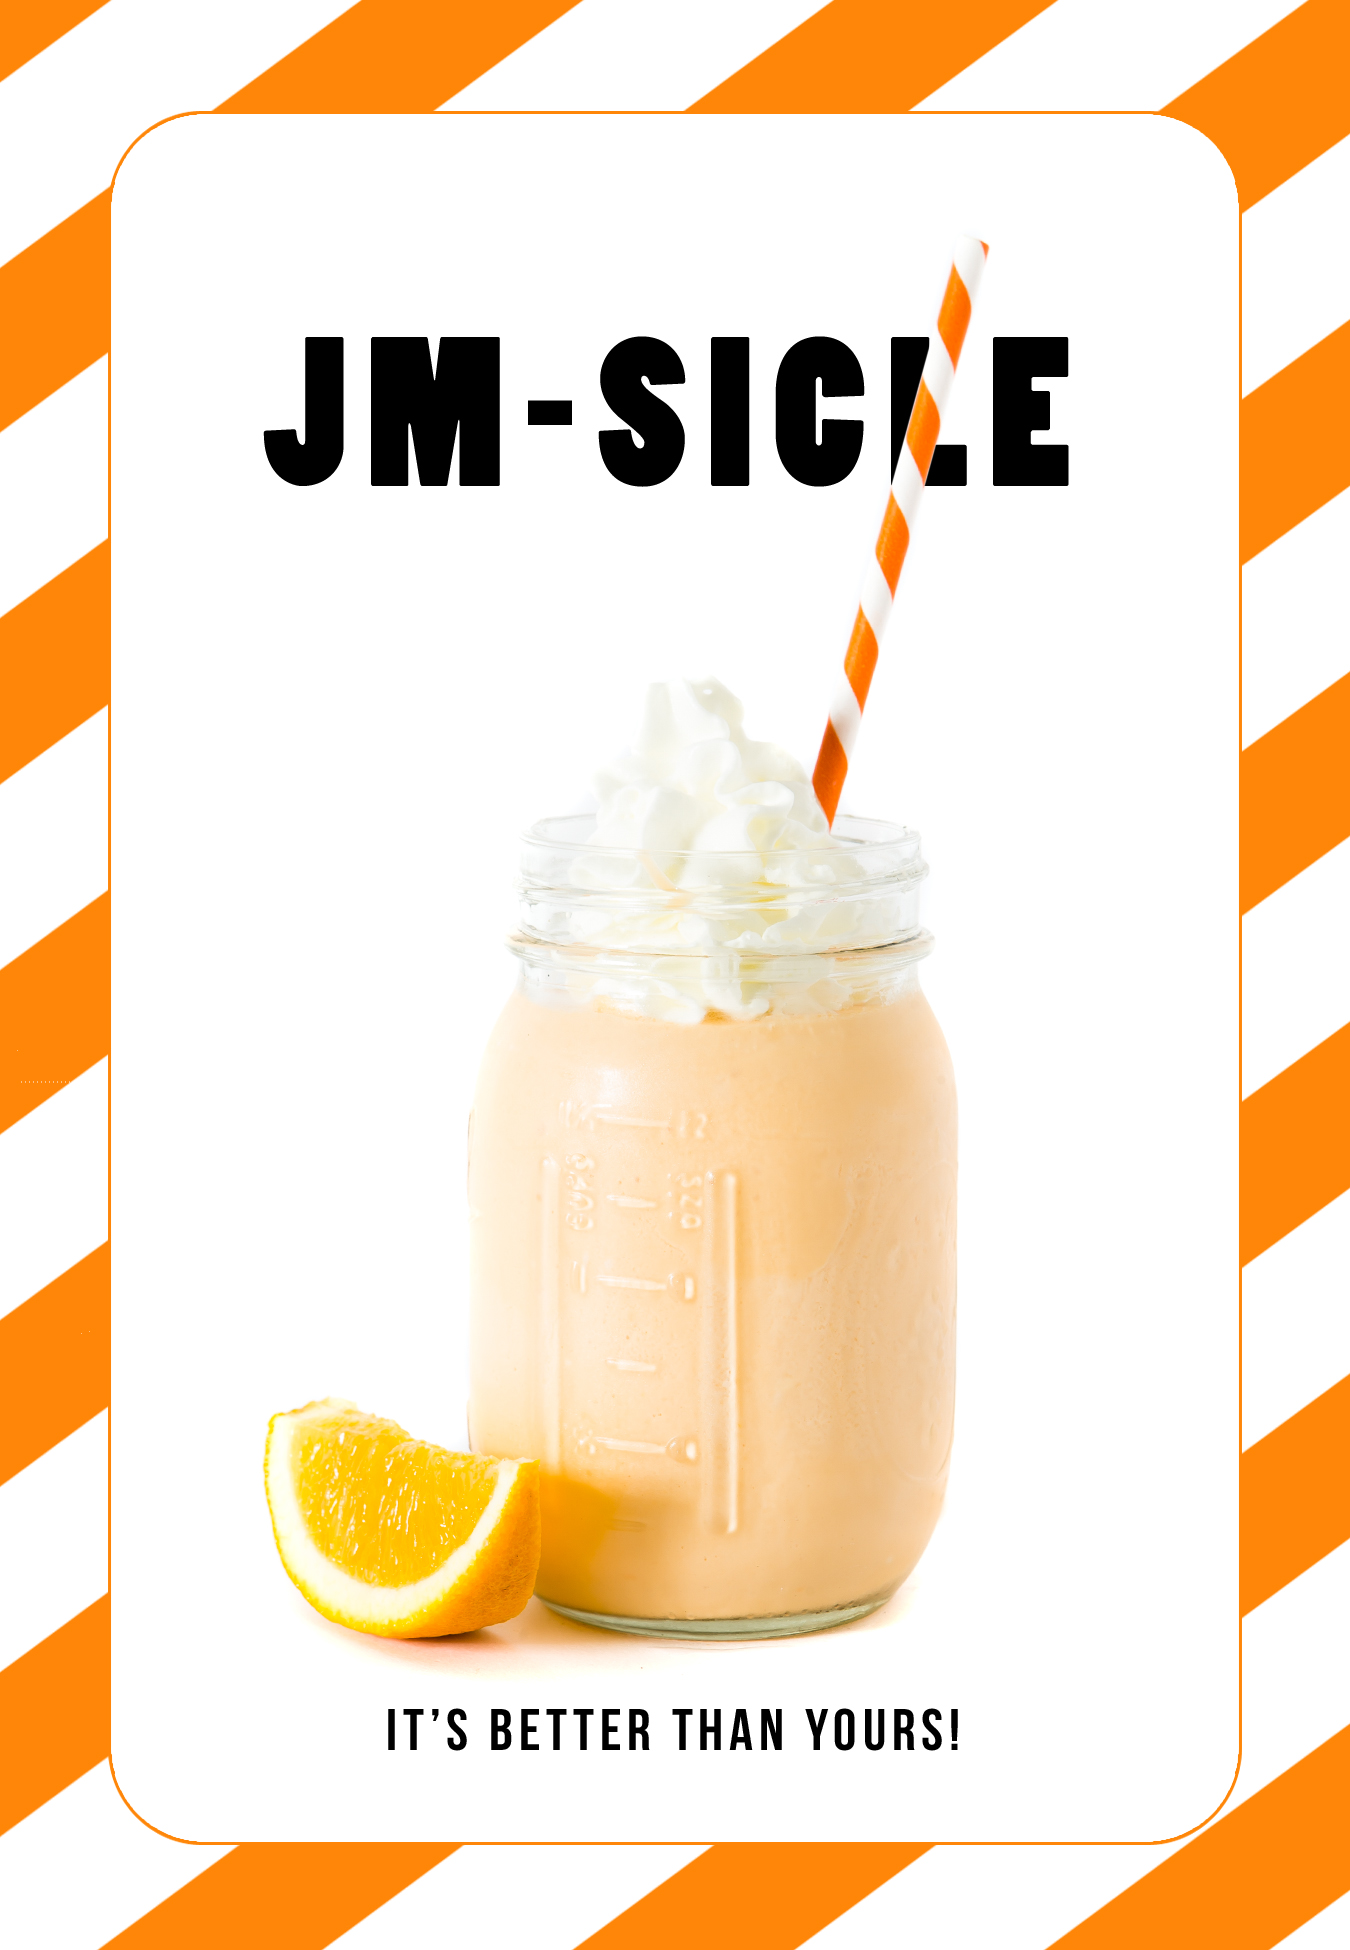 JM_sicle_side2.jpg